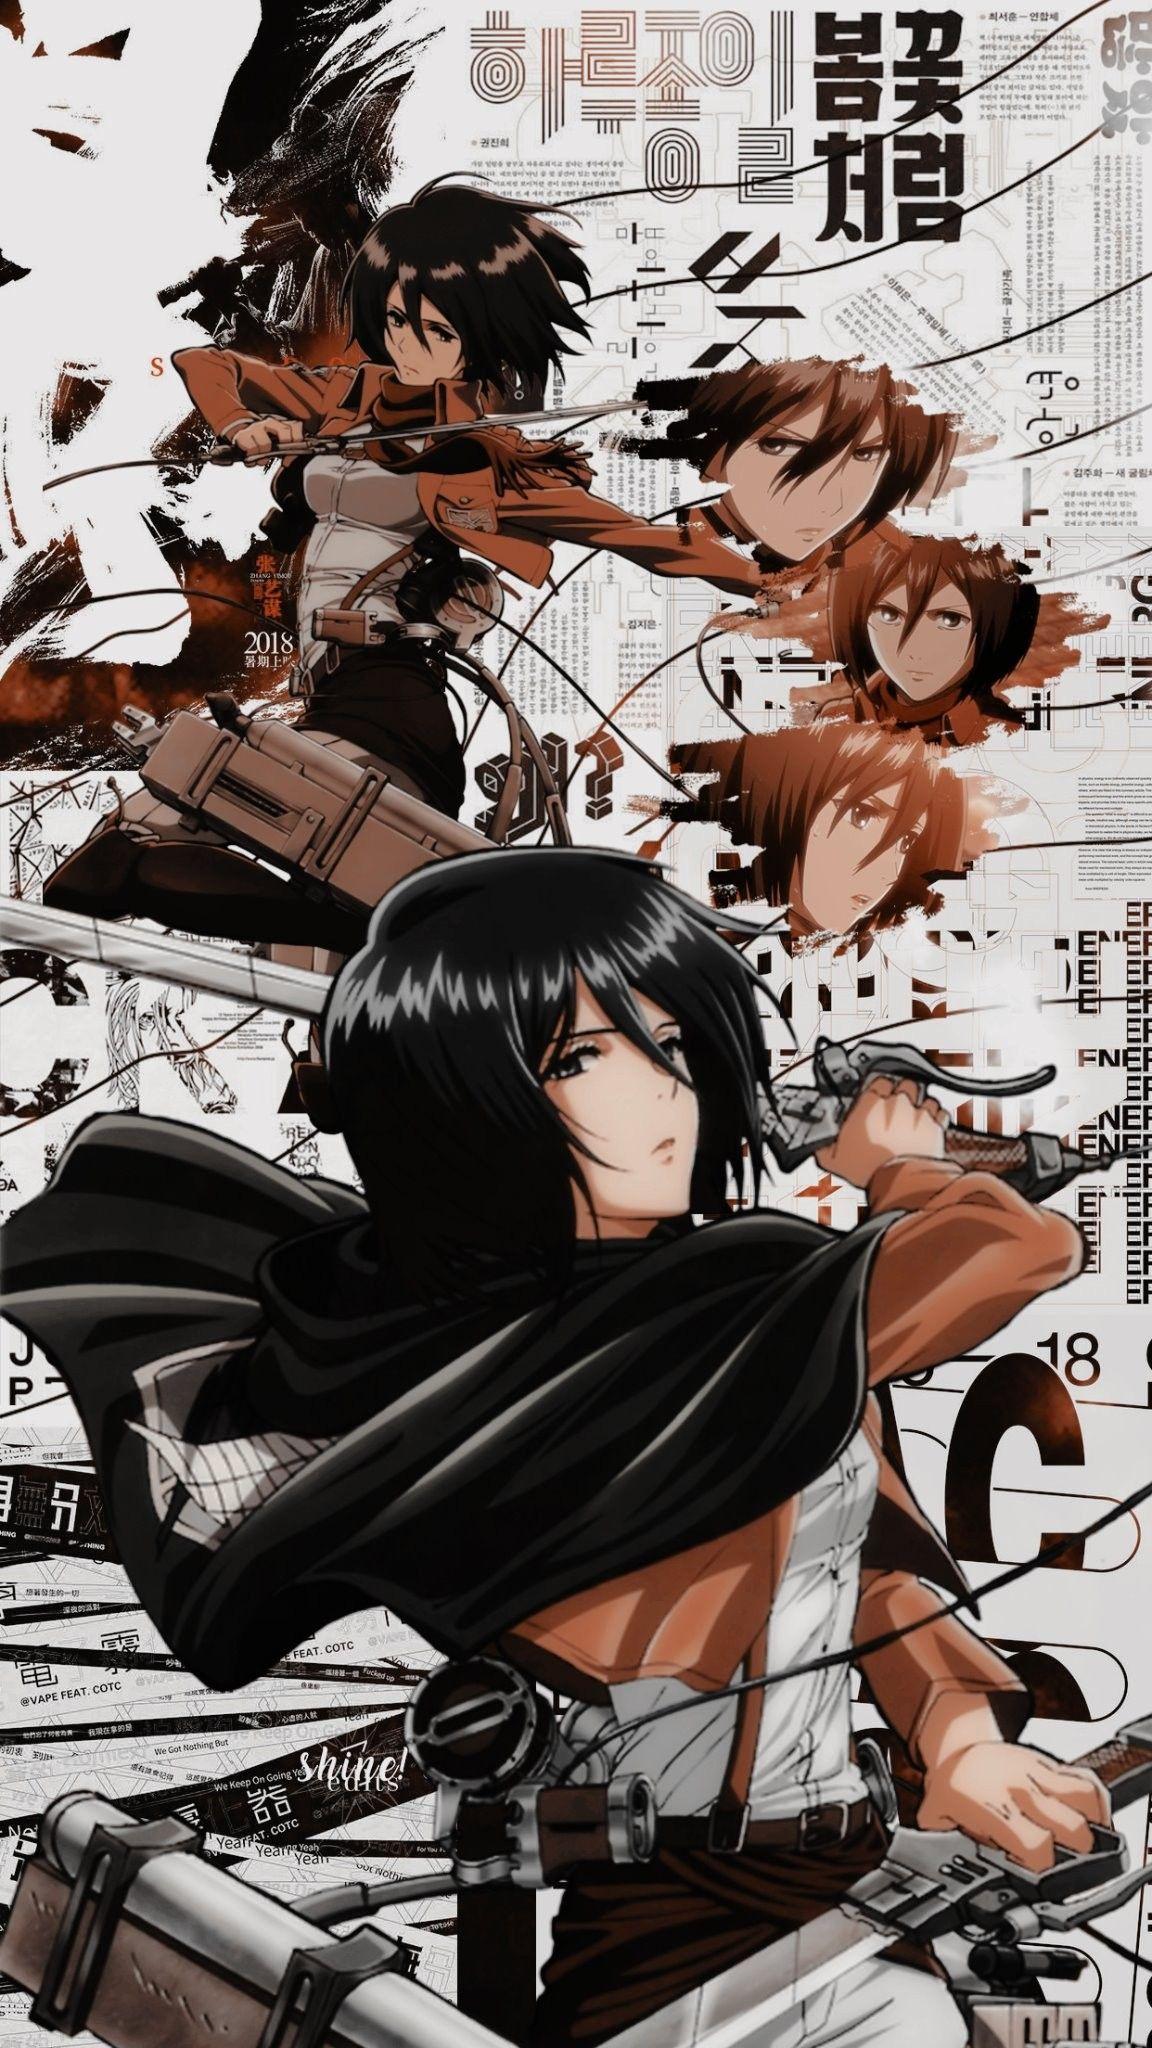 Mikasa Cksc Shingeki No Kyojin Shine Dlts Ontite R In 2020 Titans Anime Attack On Titan Fanart Attack On Titan Anime